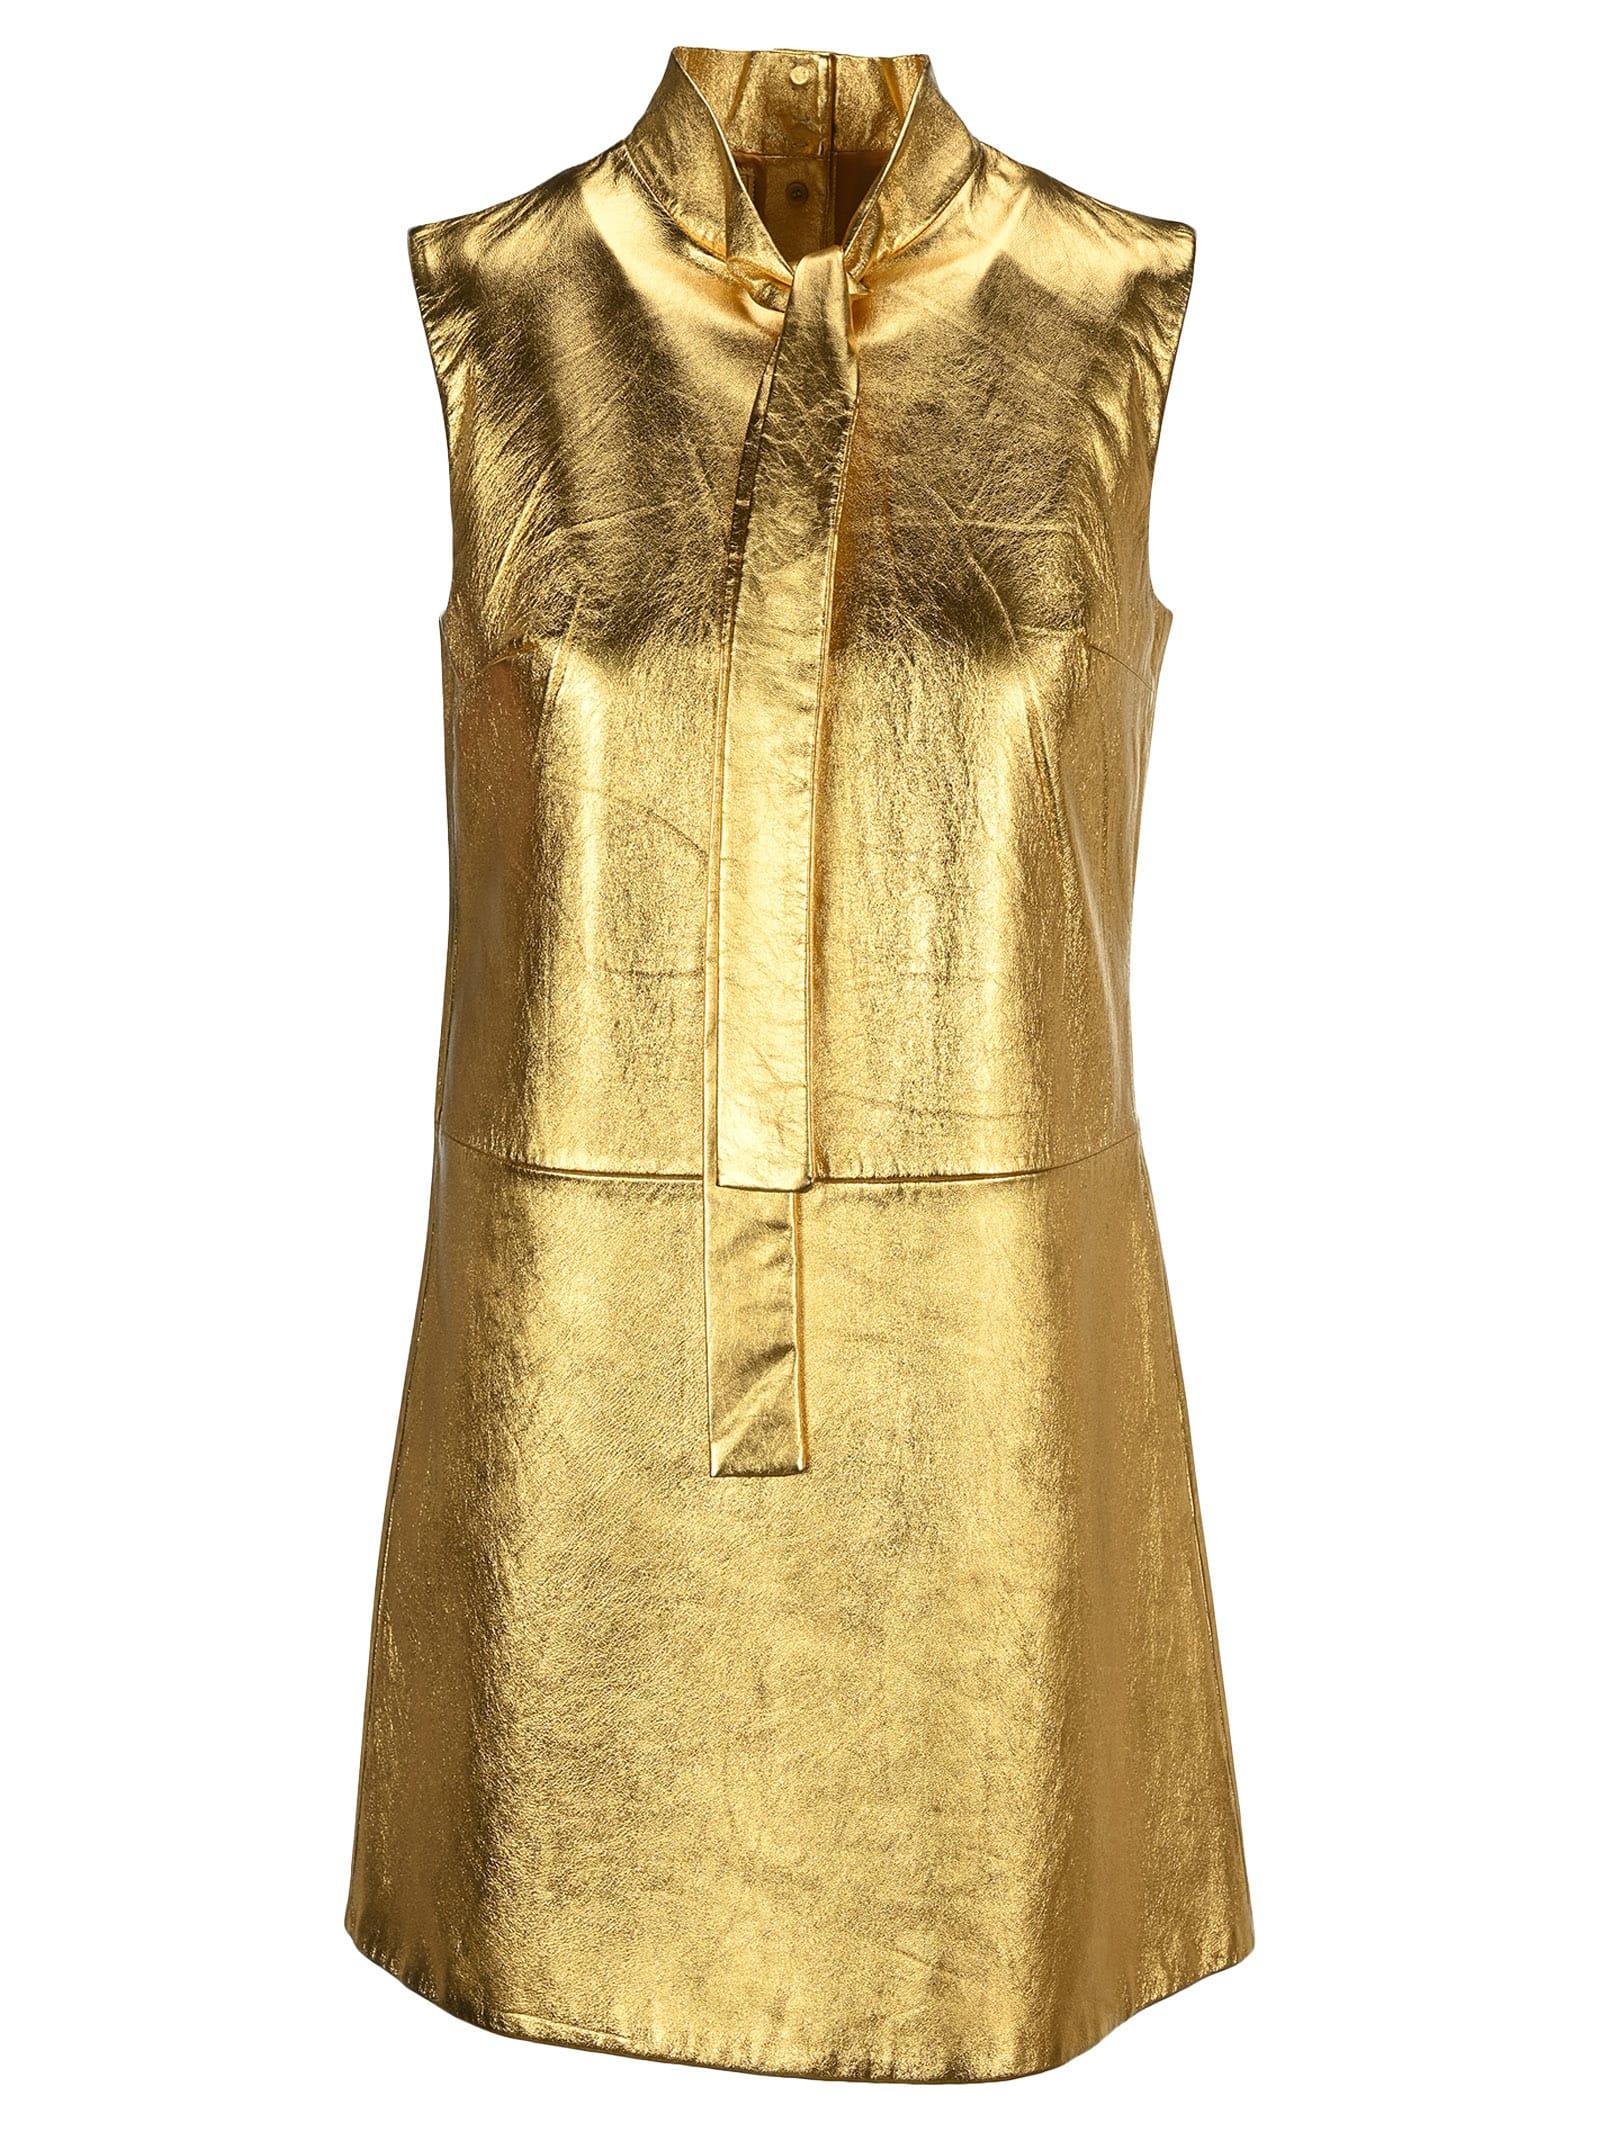 Buy Prada Laminated Nappa Leather Dress online, shop Prada with free shipping